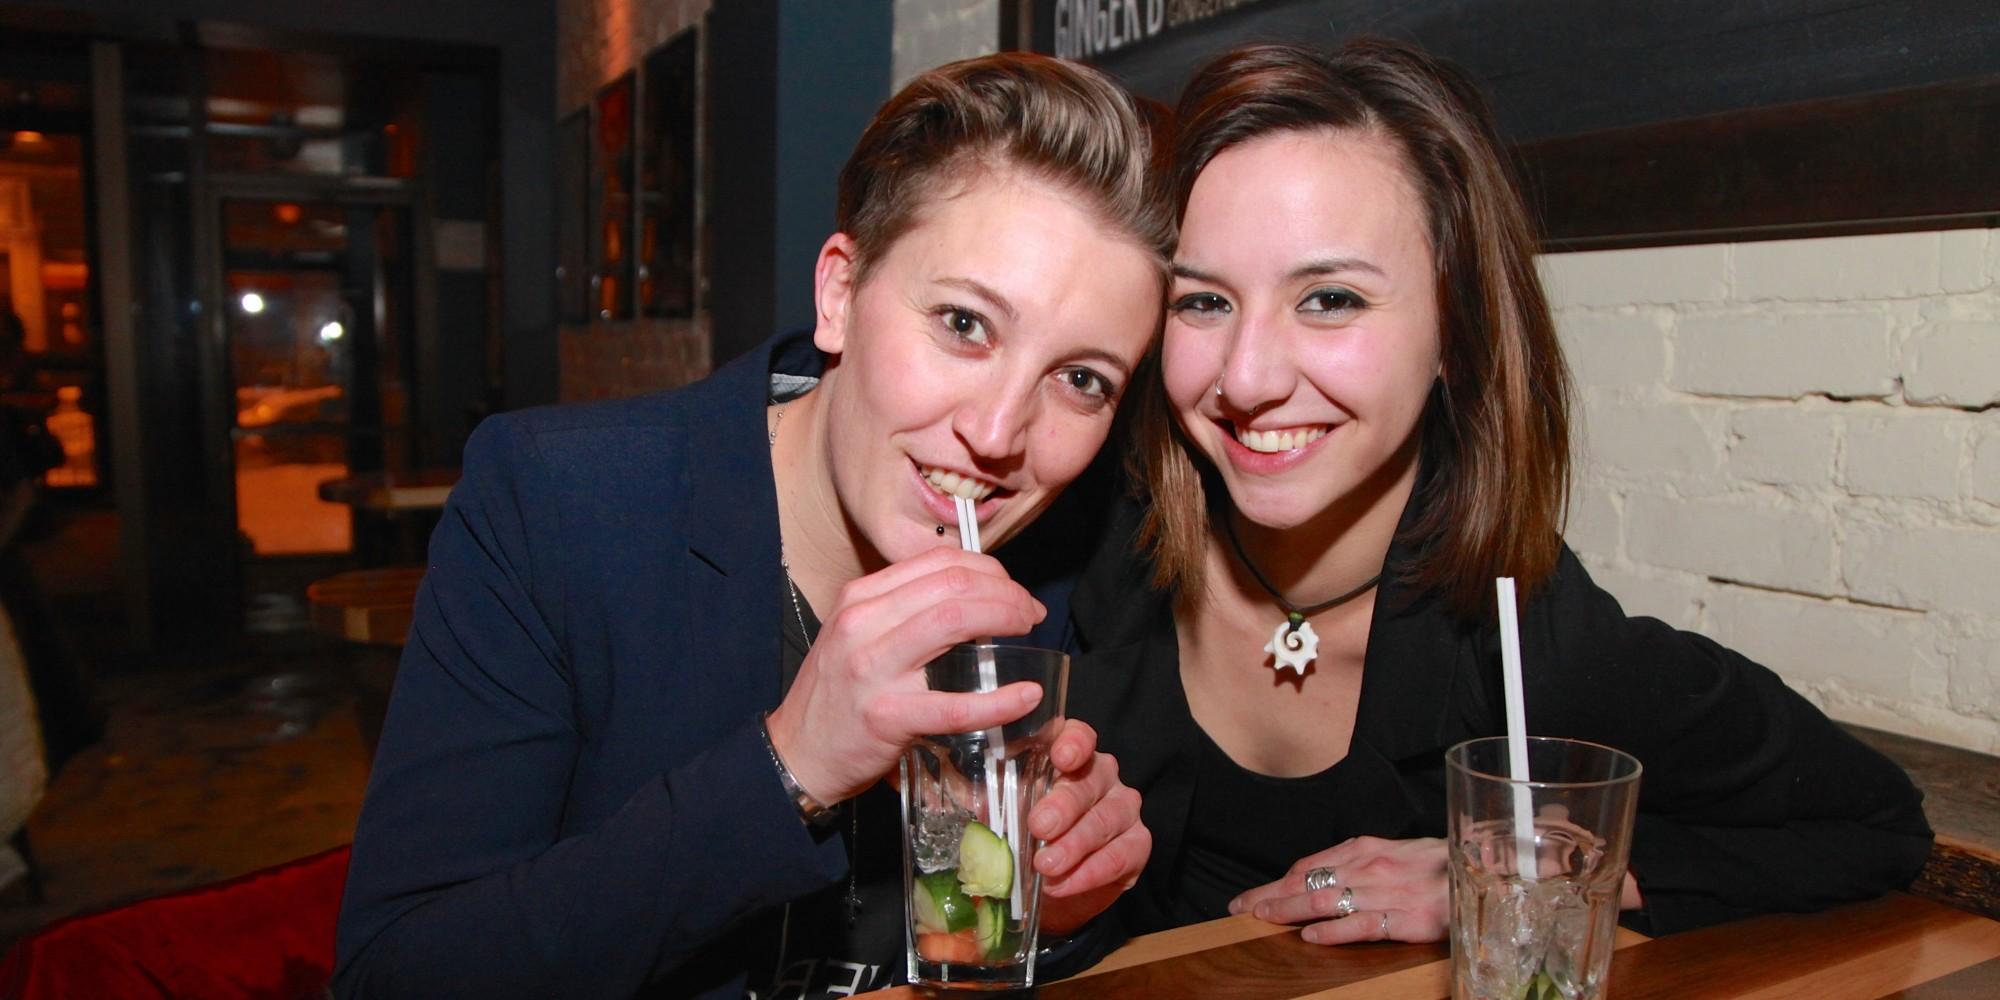 rencontre lesbienne mtl Livry-Gargan